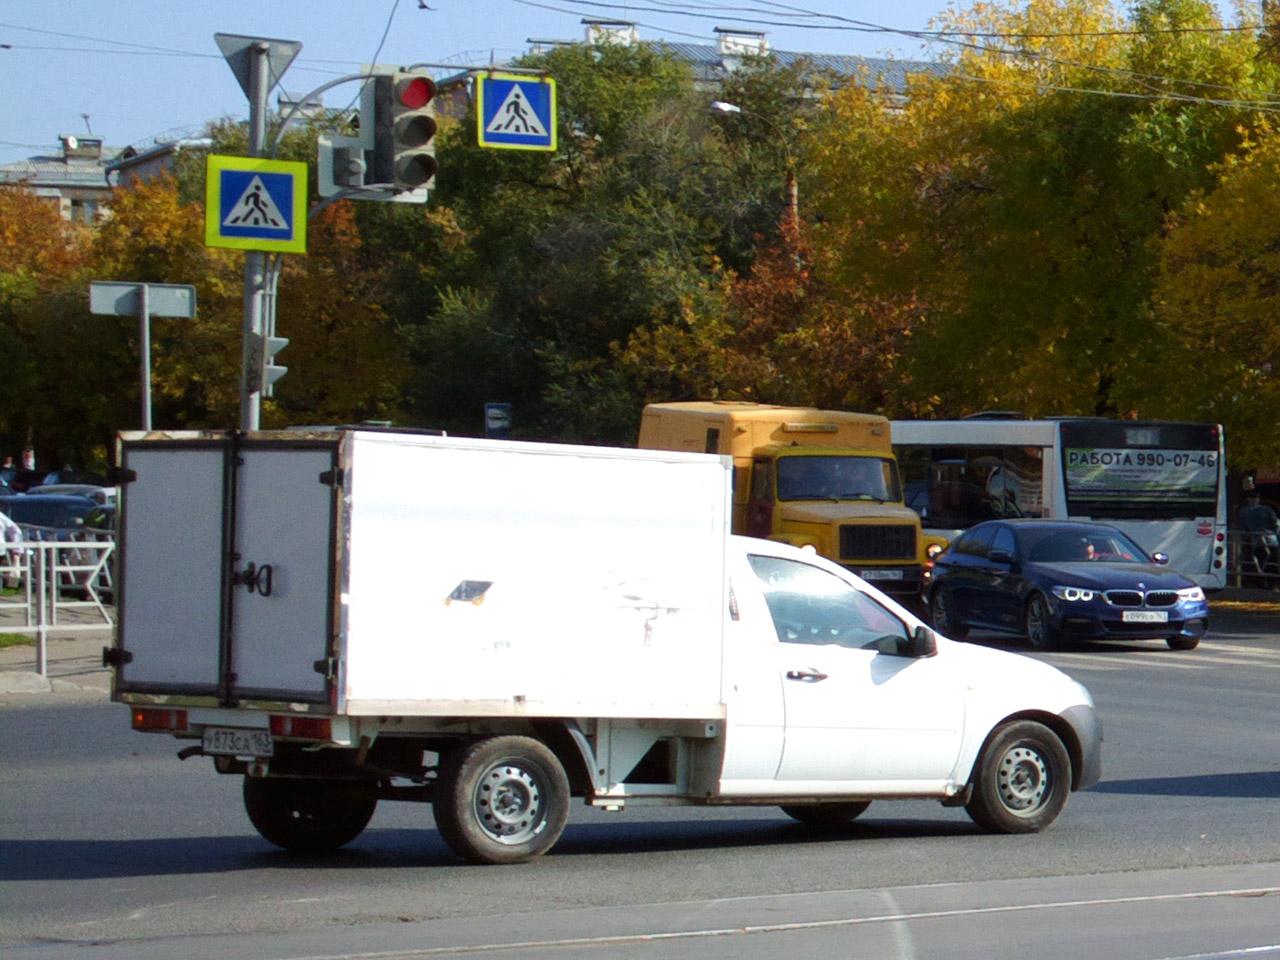 Фургон ВИС-2349 #У873СА163. г. Самара, ул. Киевская улица